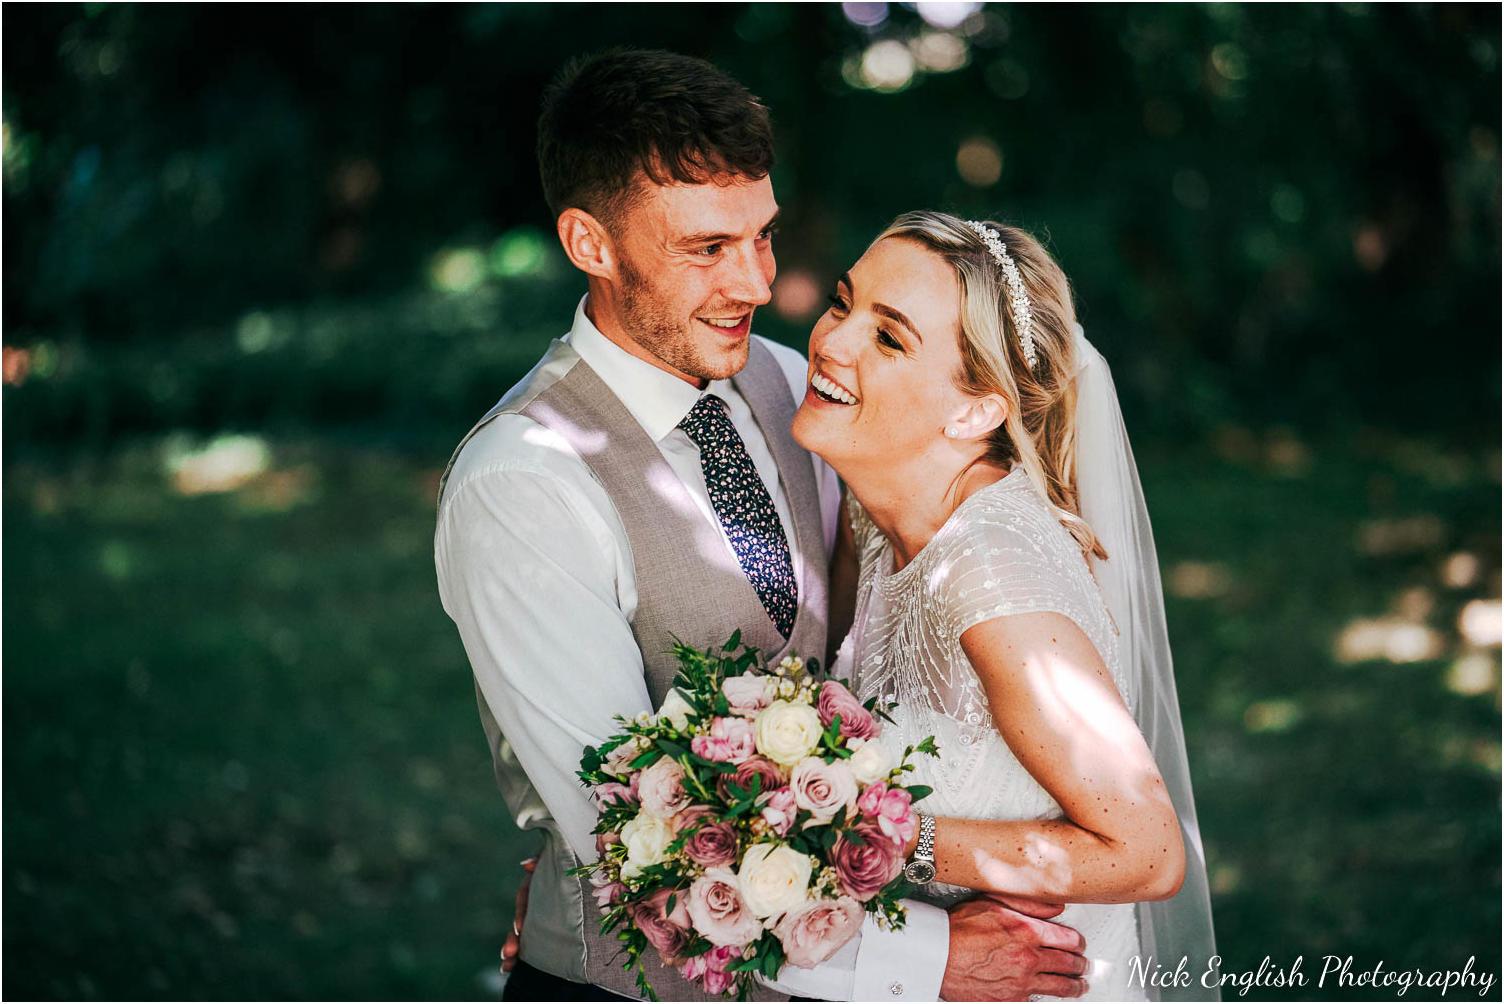 Mitton_Hall_Wedding_Photograph-139.jpg